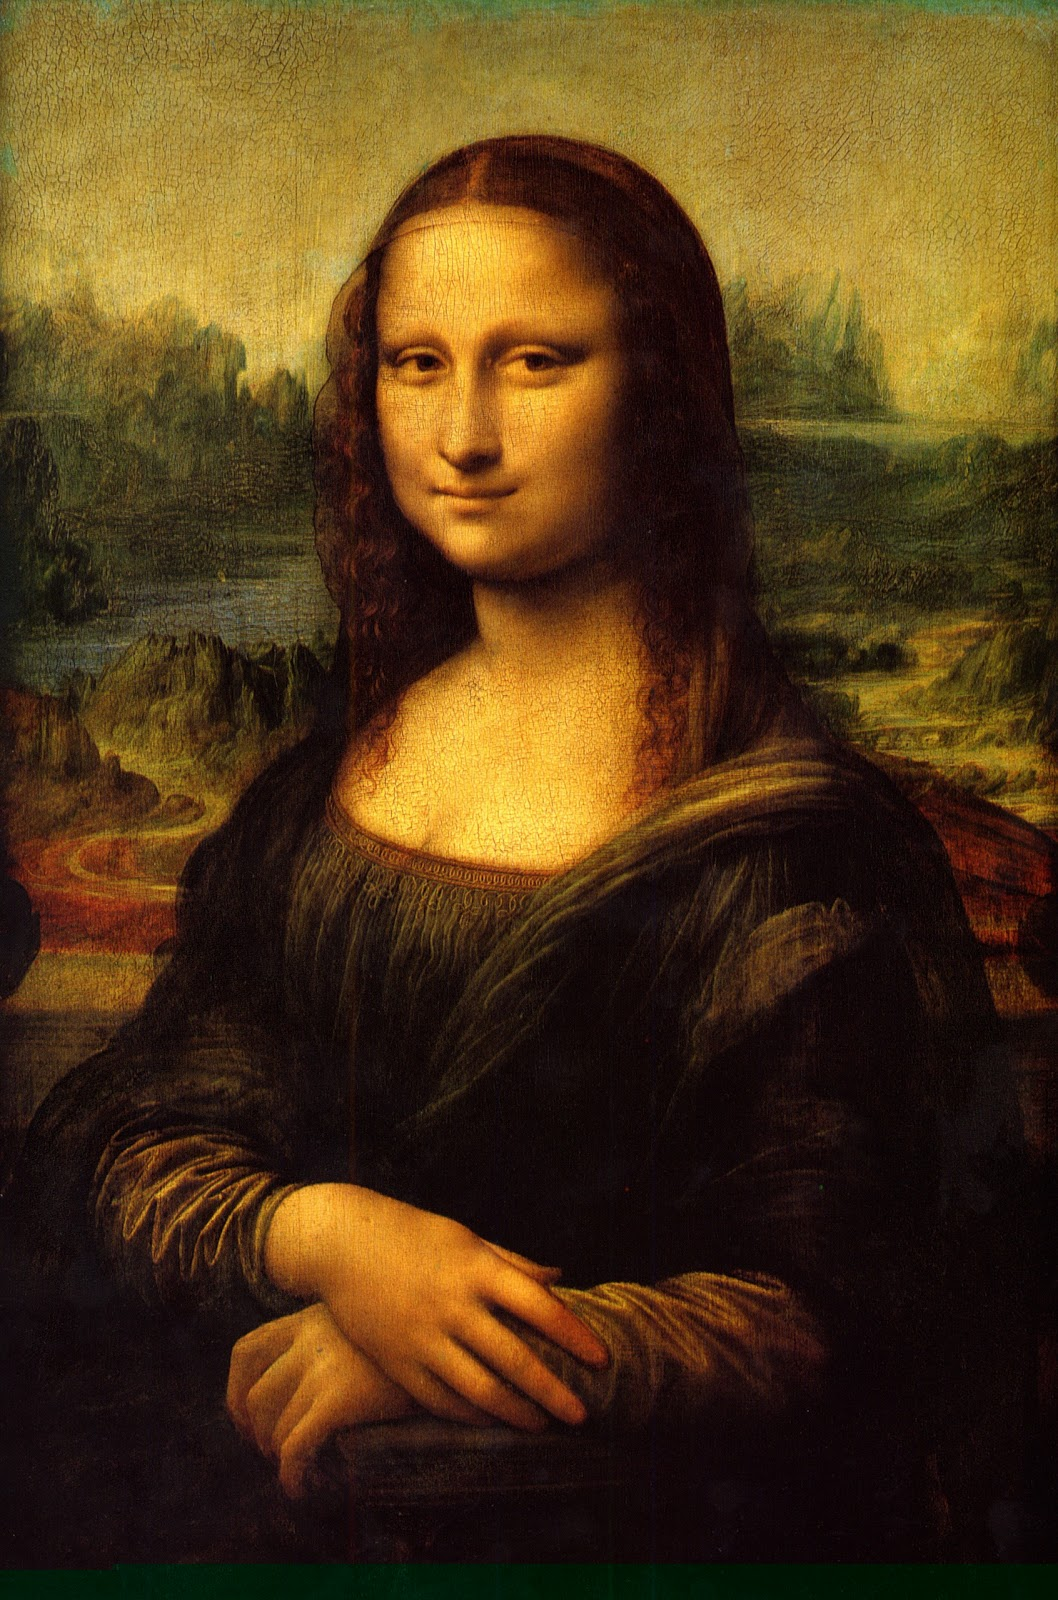 African Arts with Taj: March 2012 Da Vinci Mona Lisa